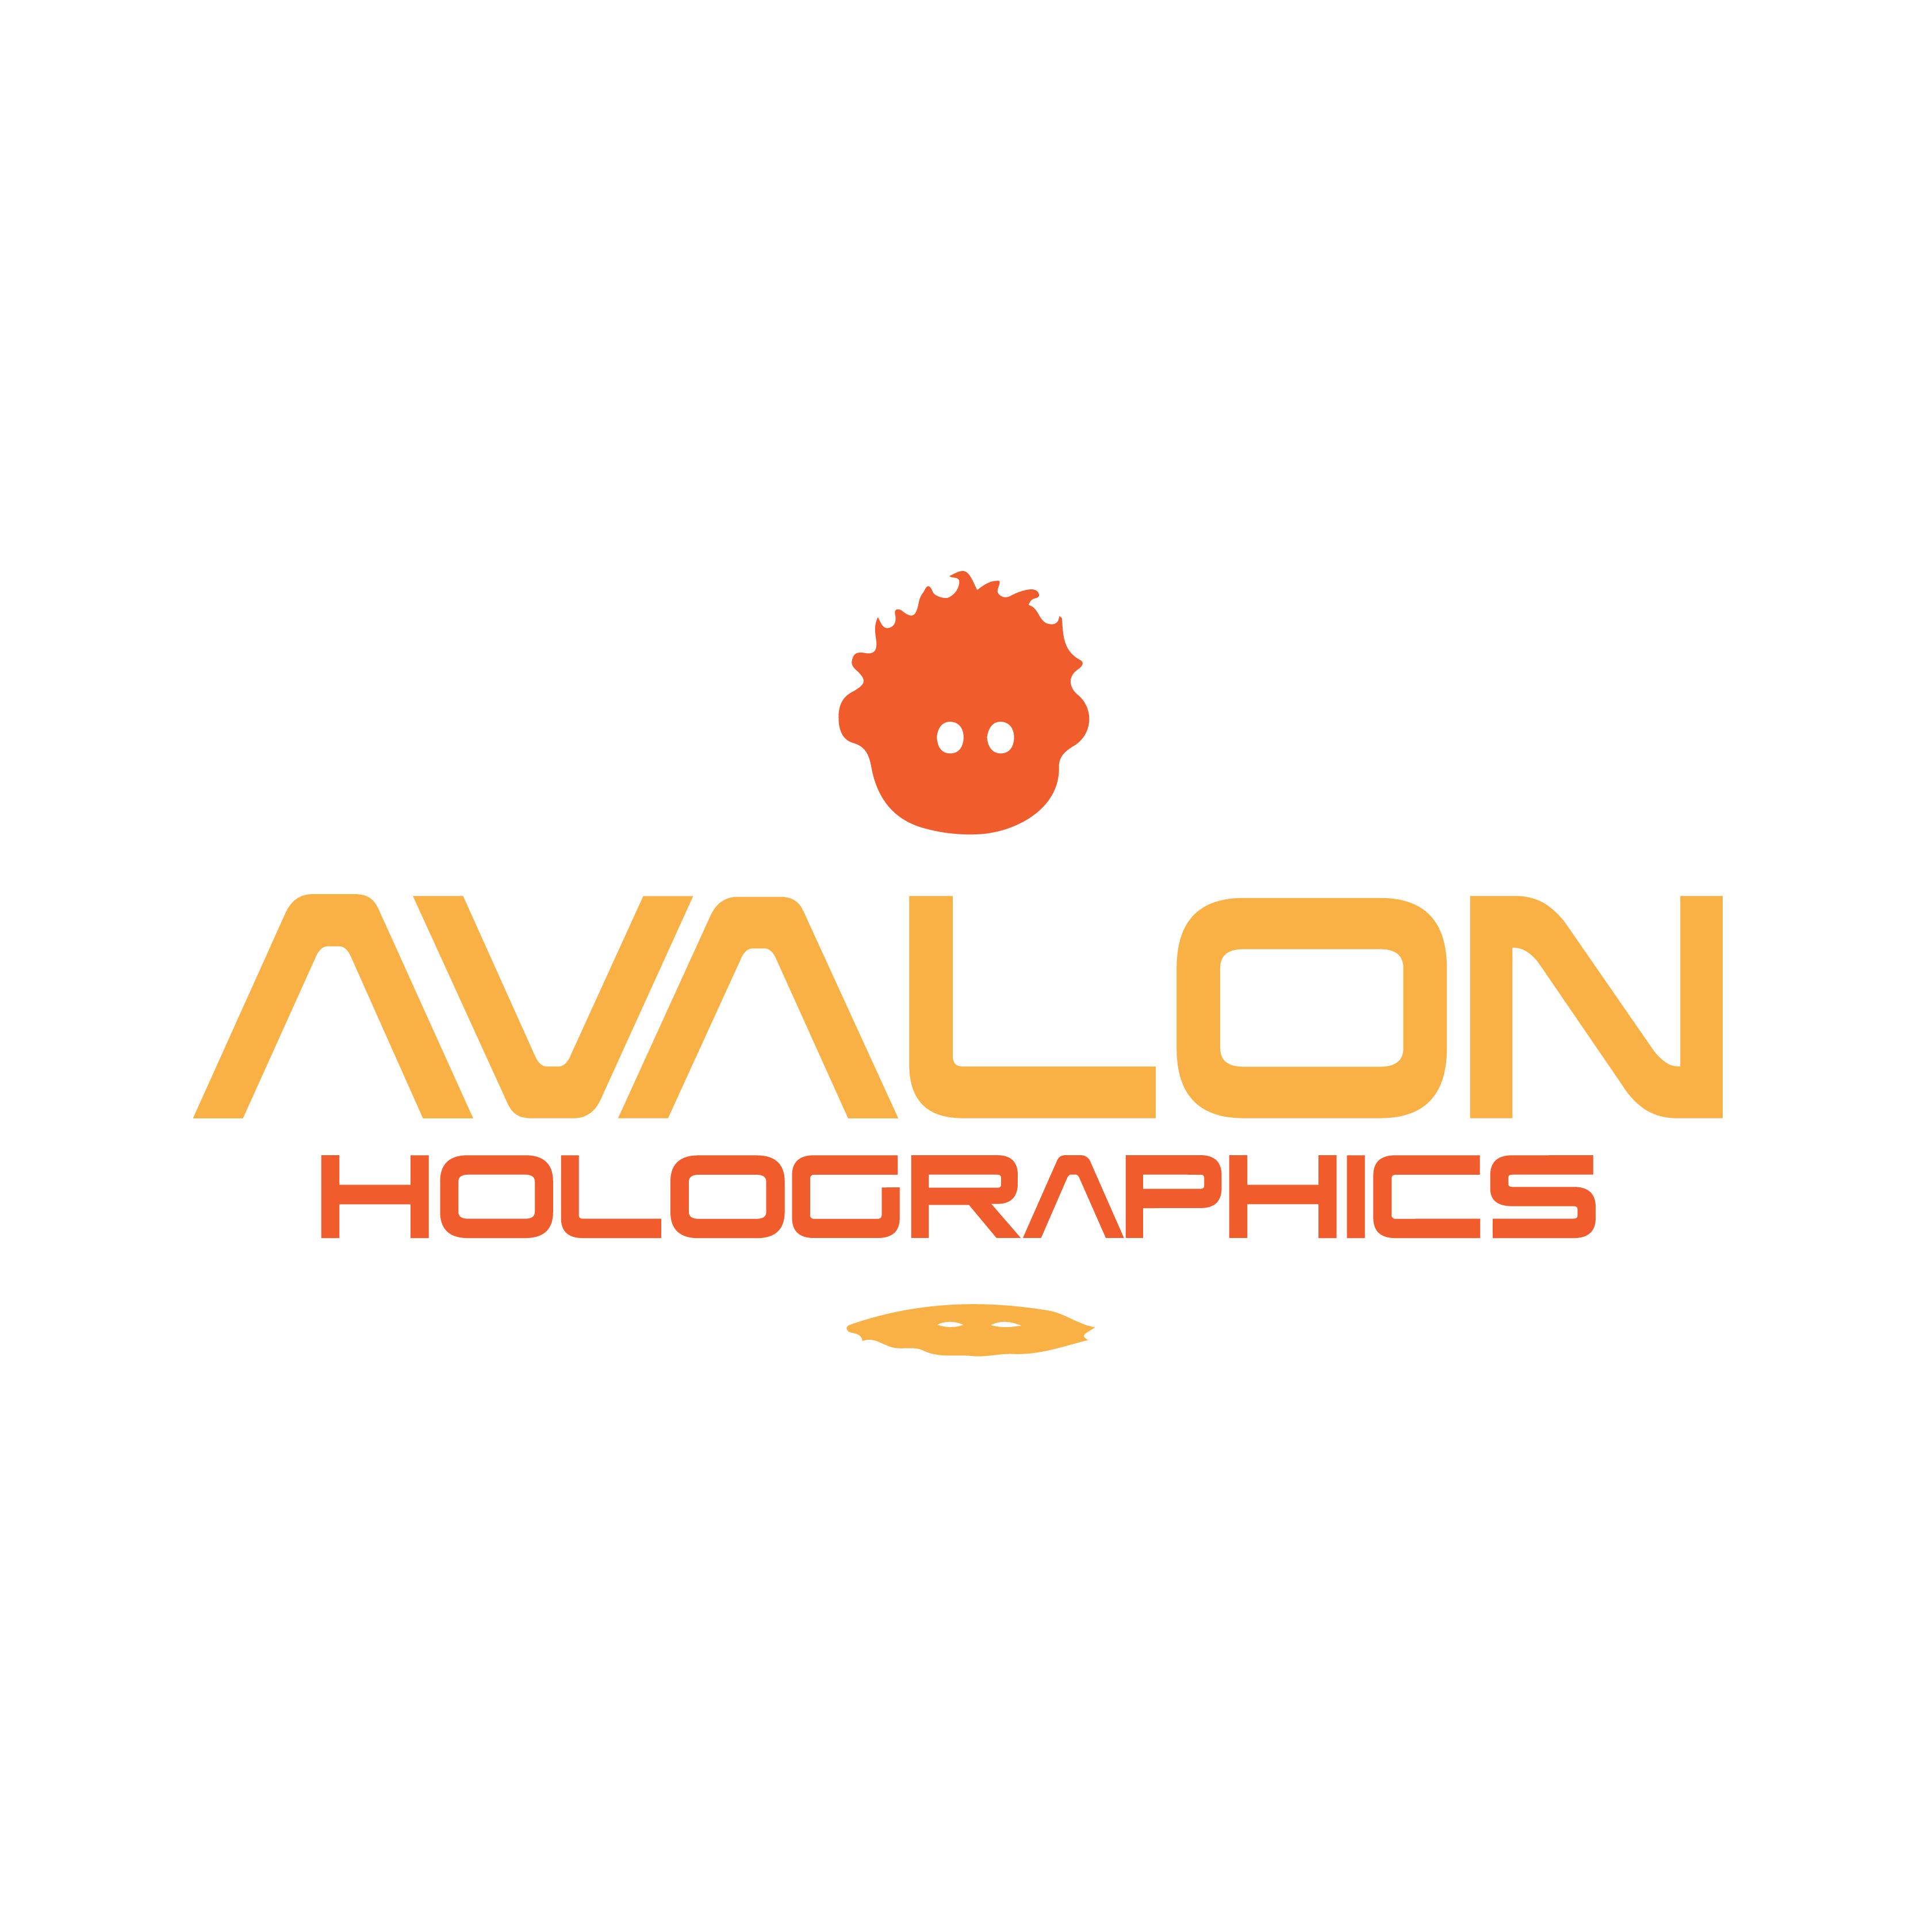 Avalon Holographics